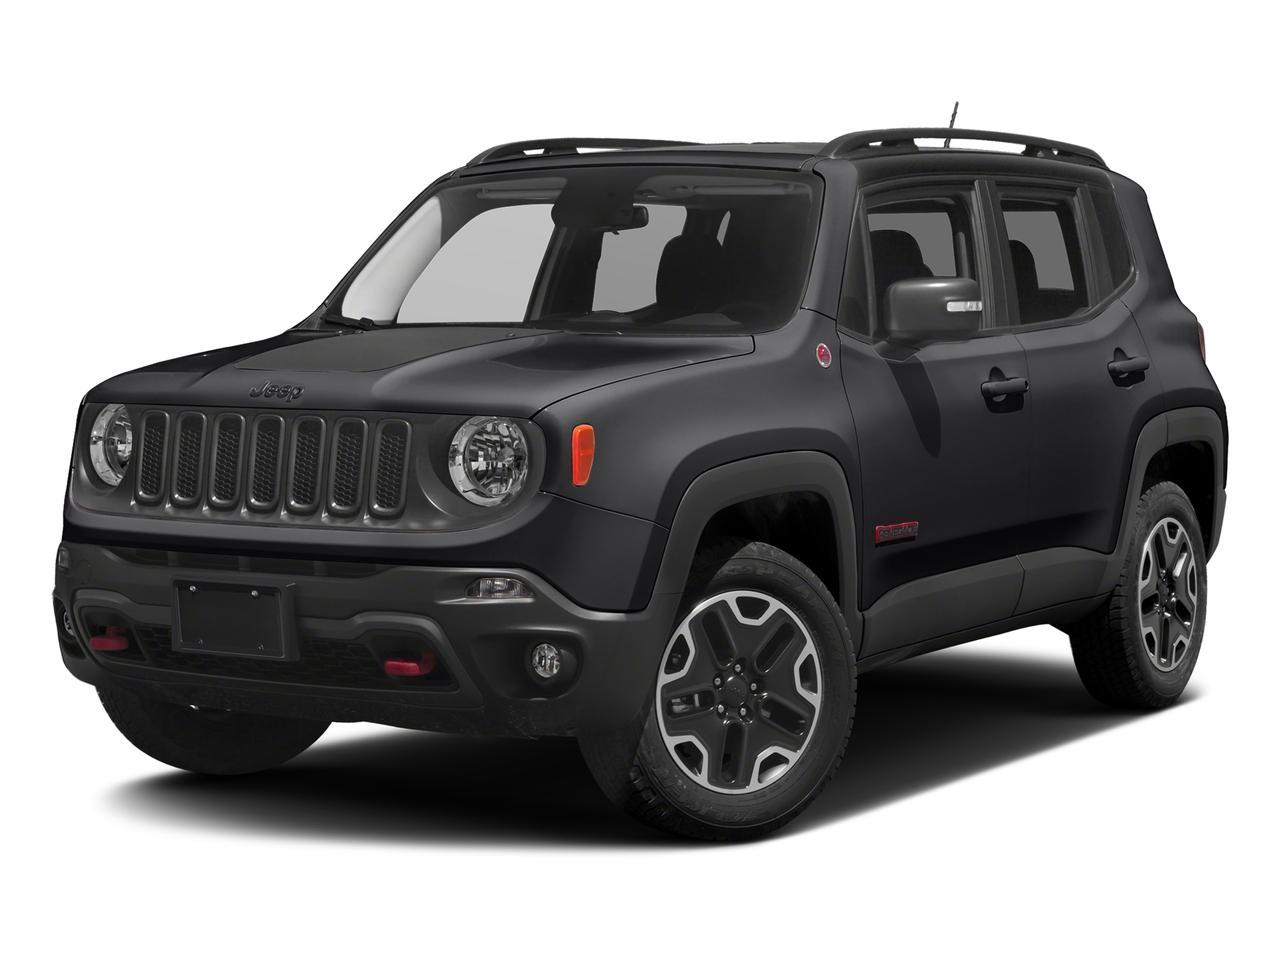 2017 Jeep Renegade Vehicle Photo in Appleton, WI 54913